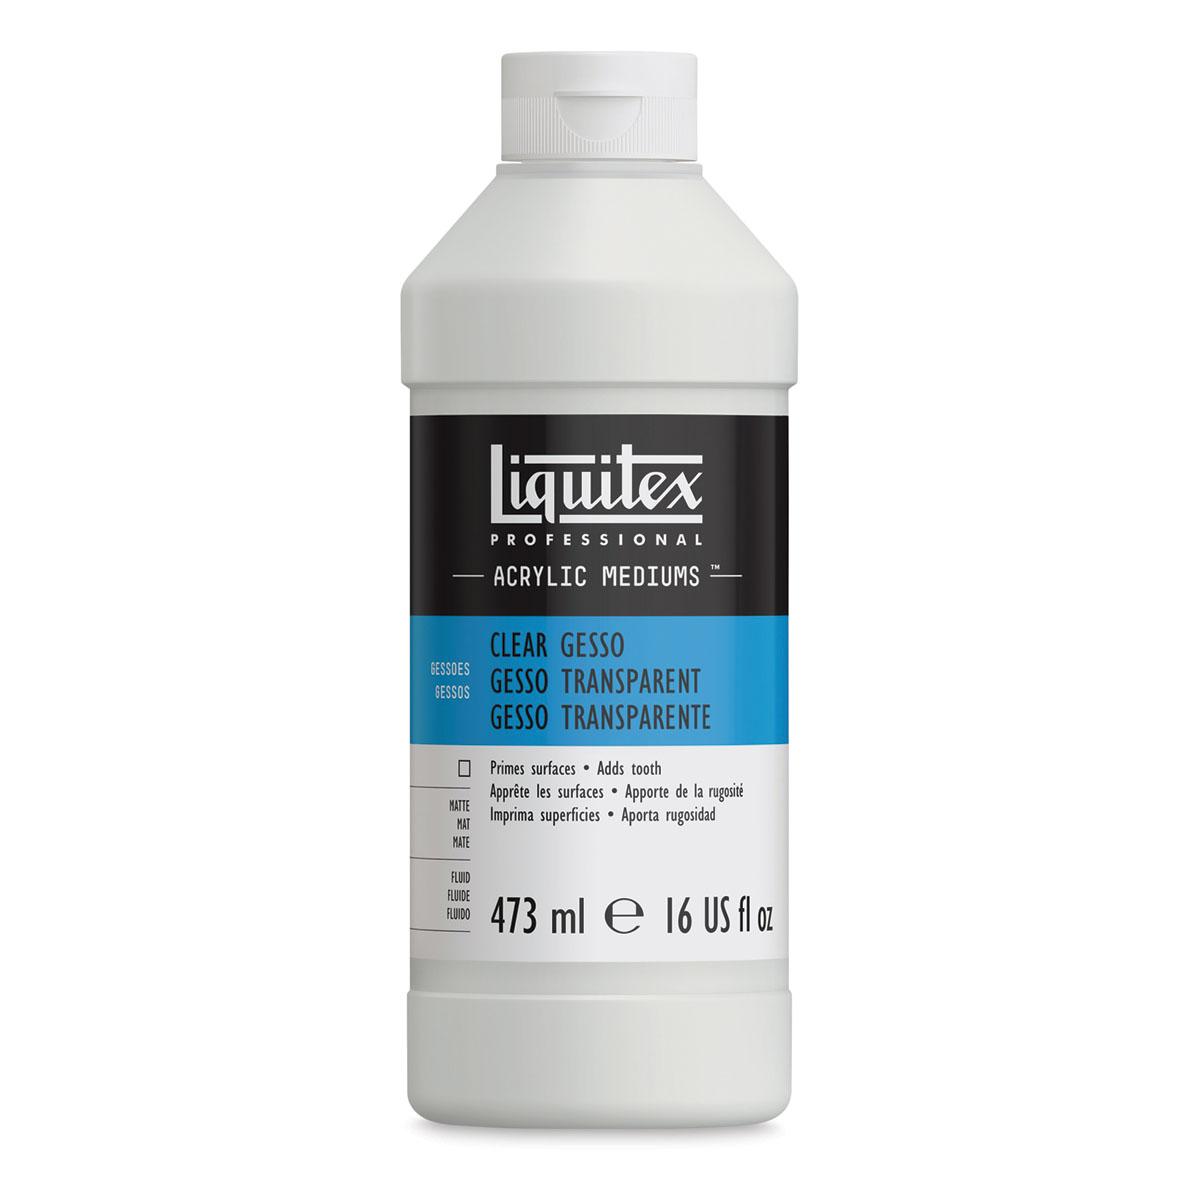 Liquitex Acrylic Gesso - Clear, 16 oz bottle